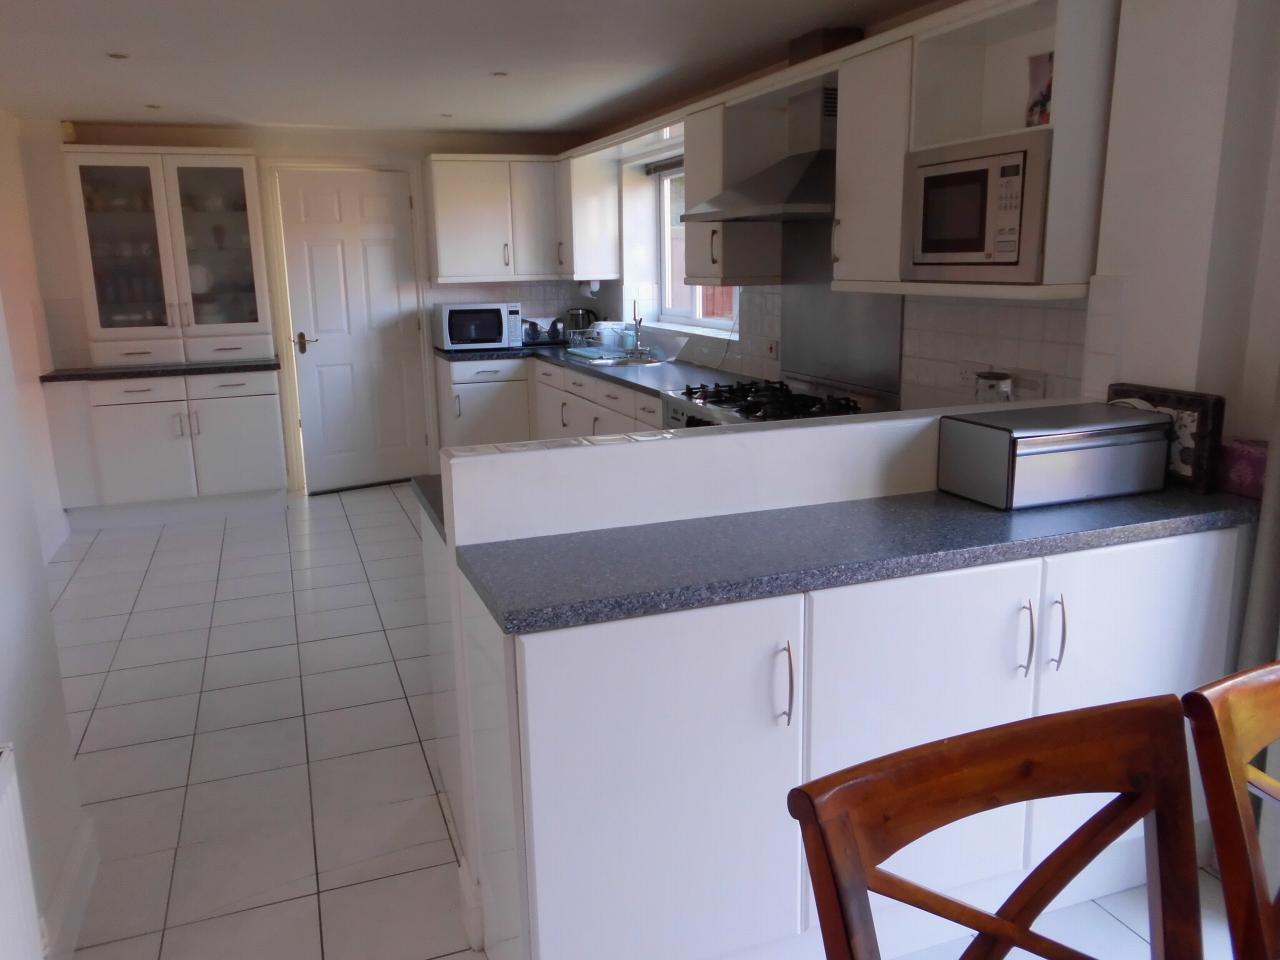 5 Bedroom Detached House For Sale 4 Cransley Close Image 7